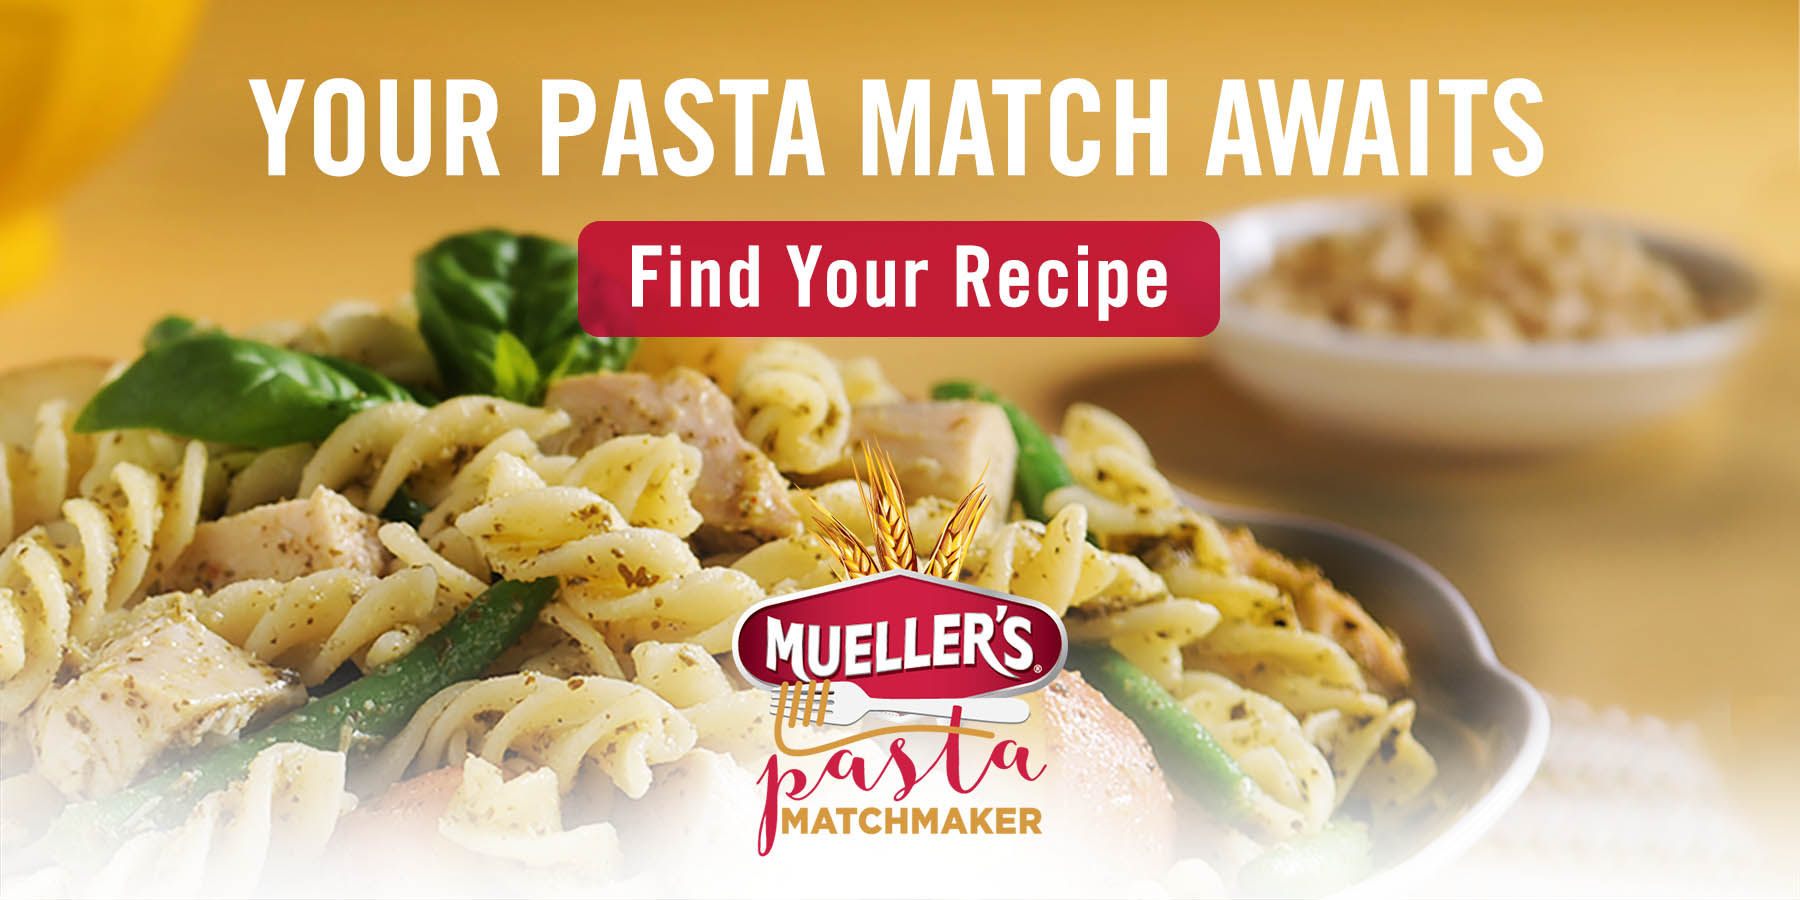 Pasta Matchmaker